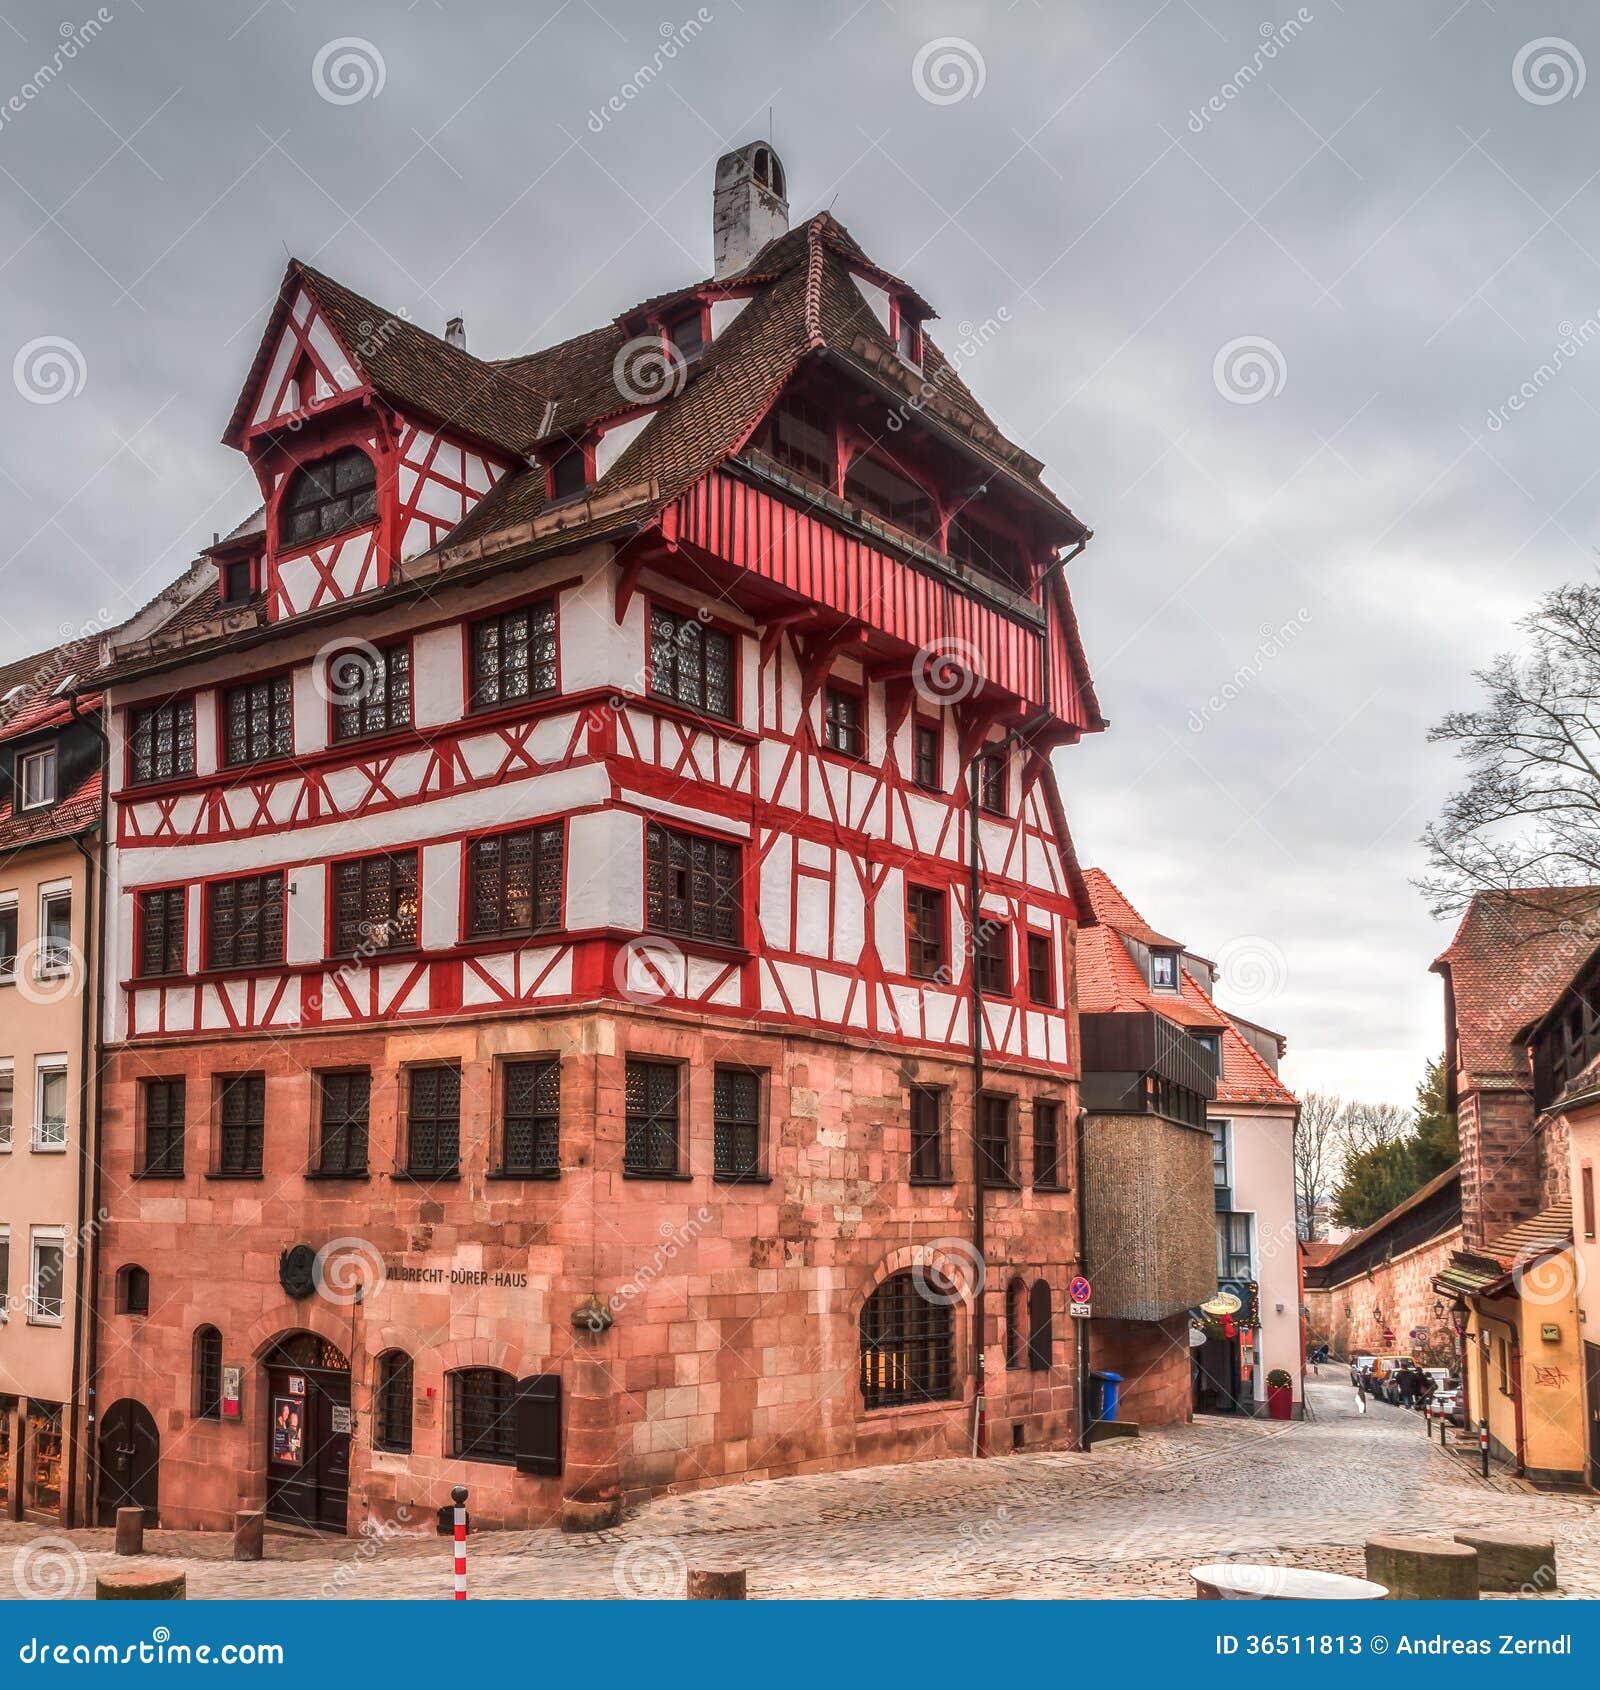 Albrecht Durer House historique à Nuremberg